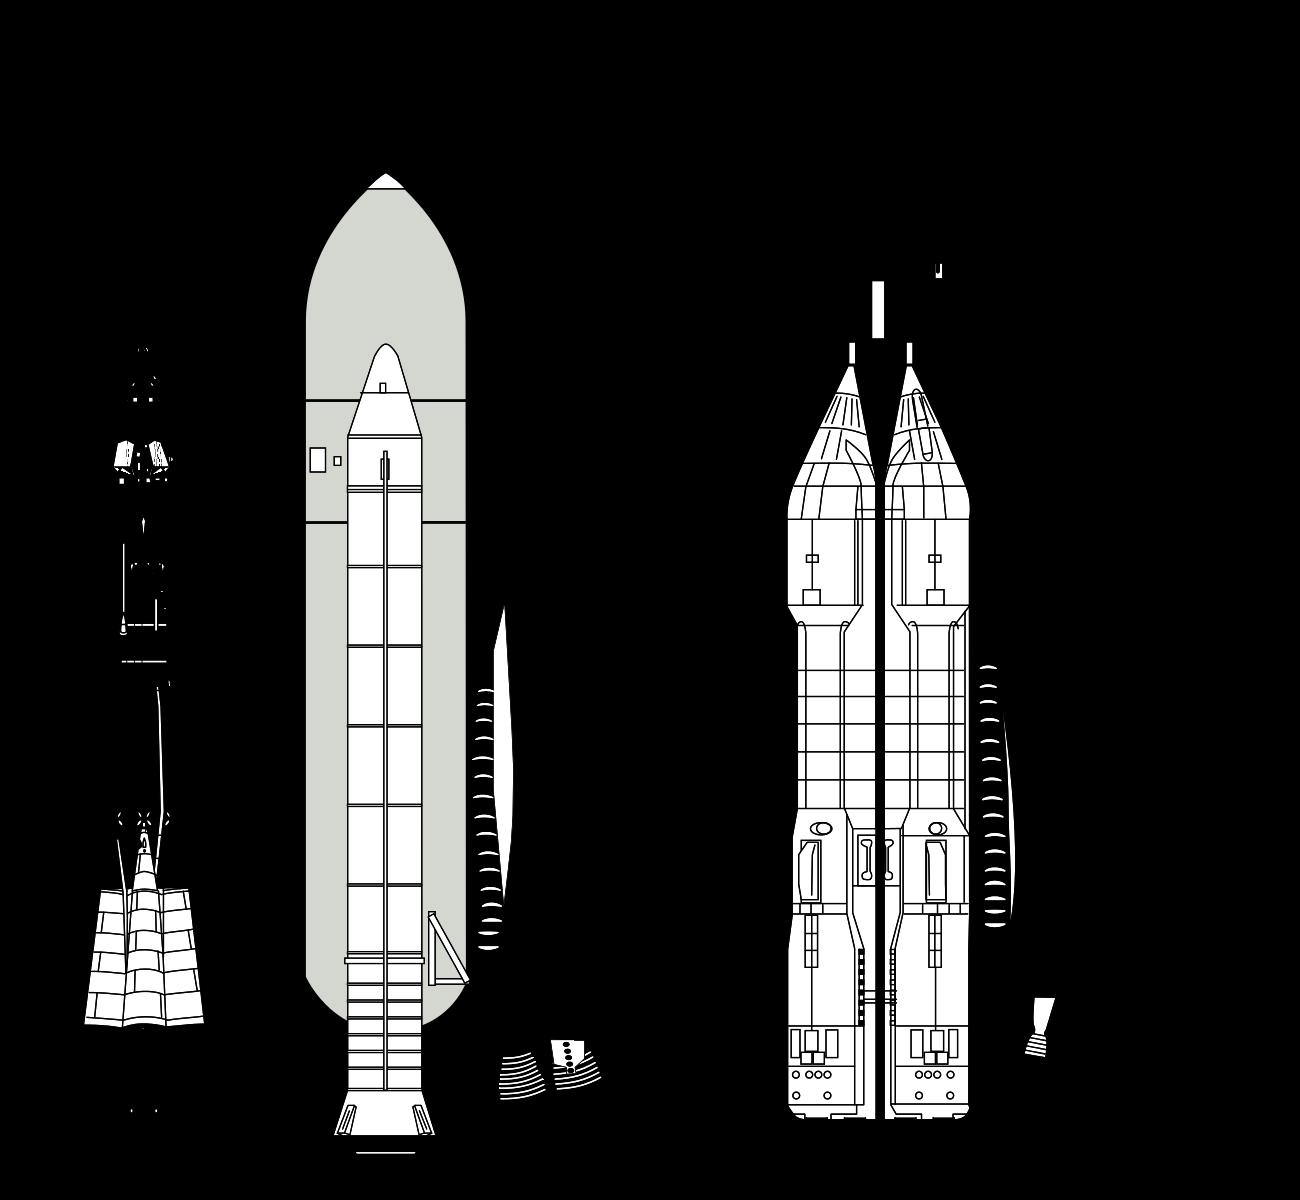 """Союз"", ""Спейс шаттл"" и ""Энергия-Буран""― сравнение. Фото: © Wikipedia.org"